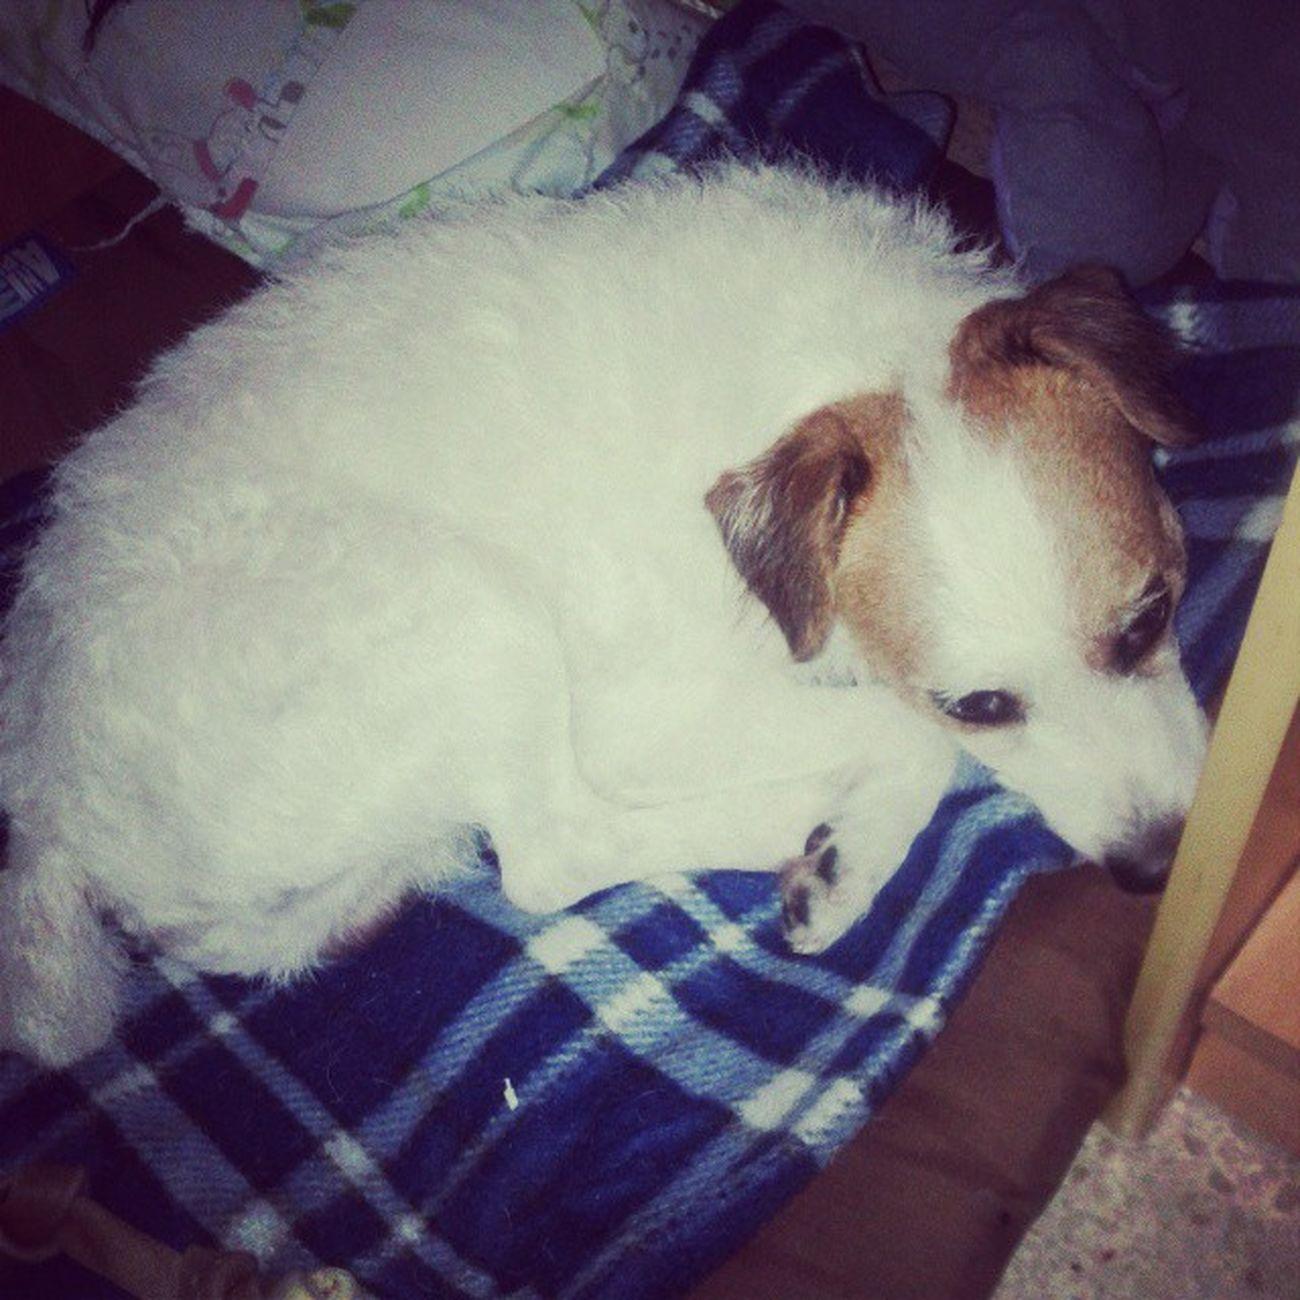 My babt boo is ready for sleep Ozzyosbourne Instadog Insta_dog Jackrussell jackrussellterrier doglover dogs